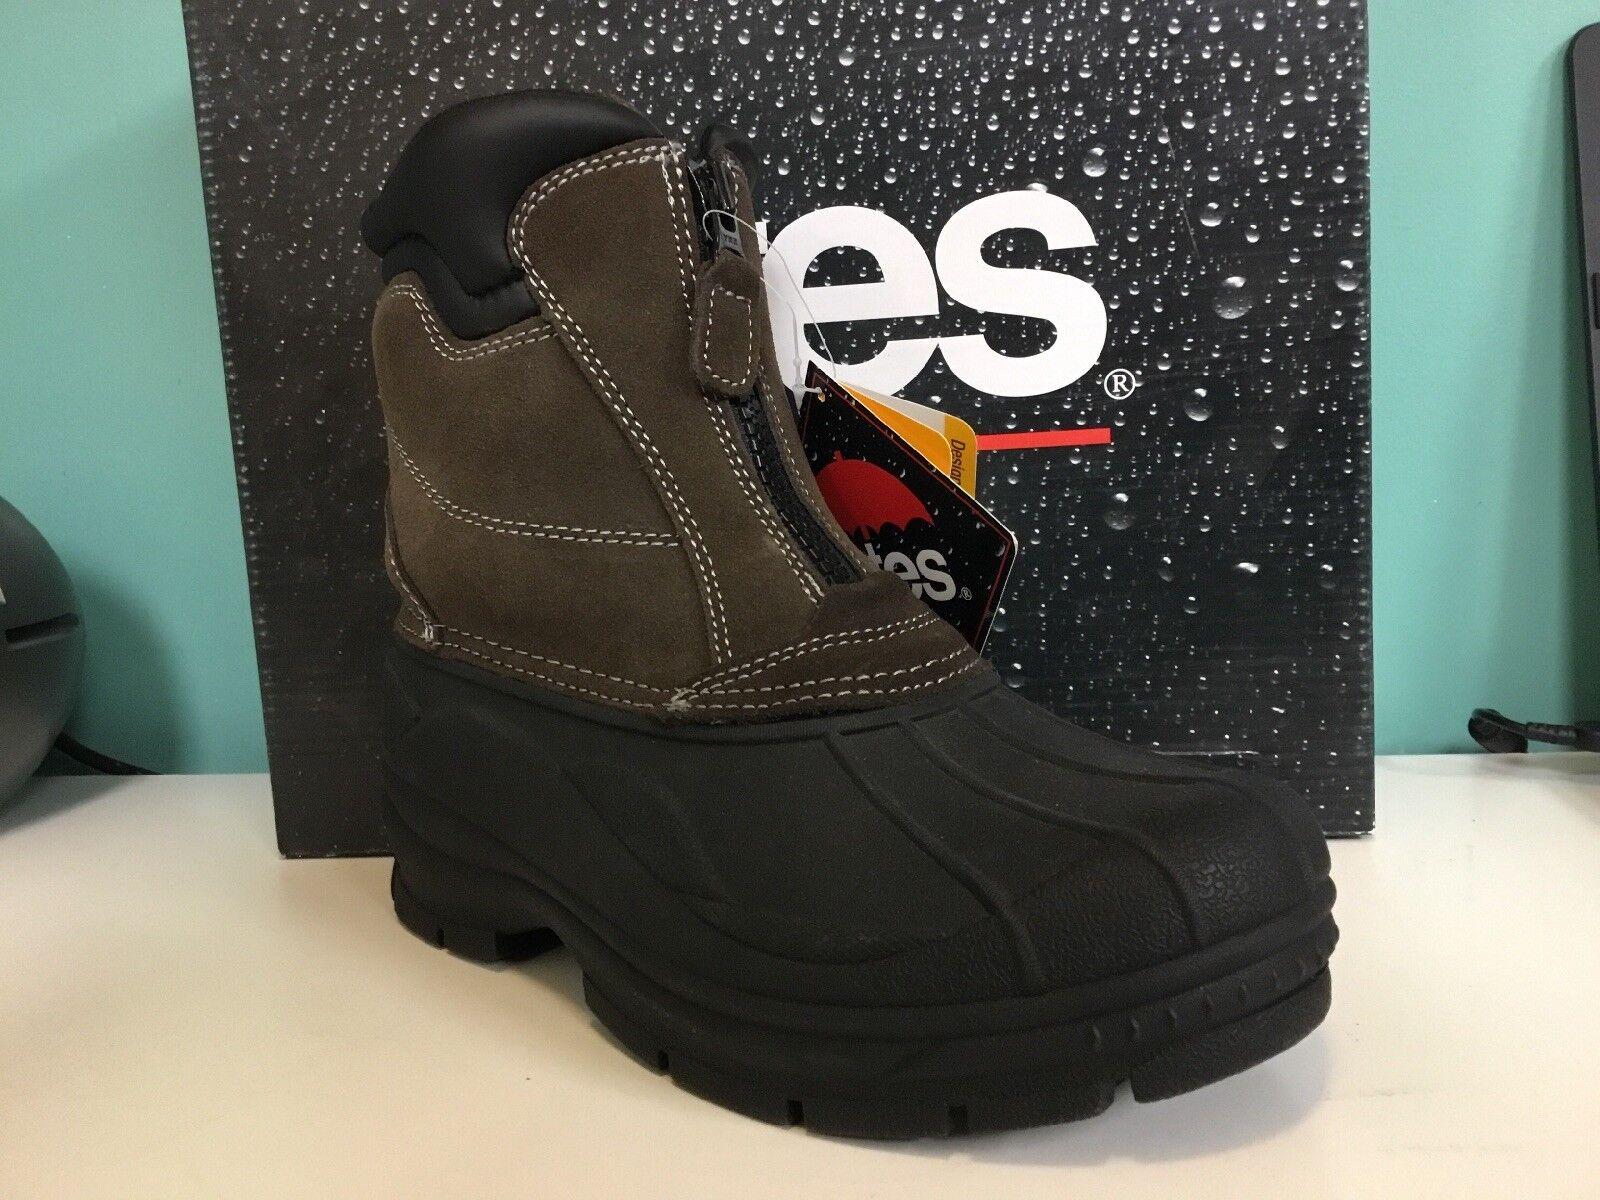 New Mens Totes Winter Snow Boot Glacier Zip Size 8